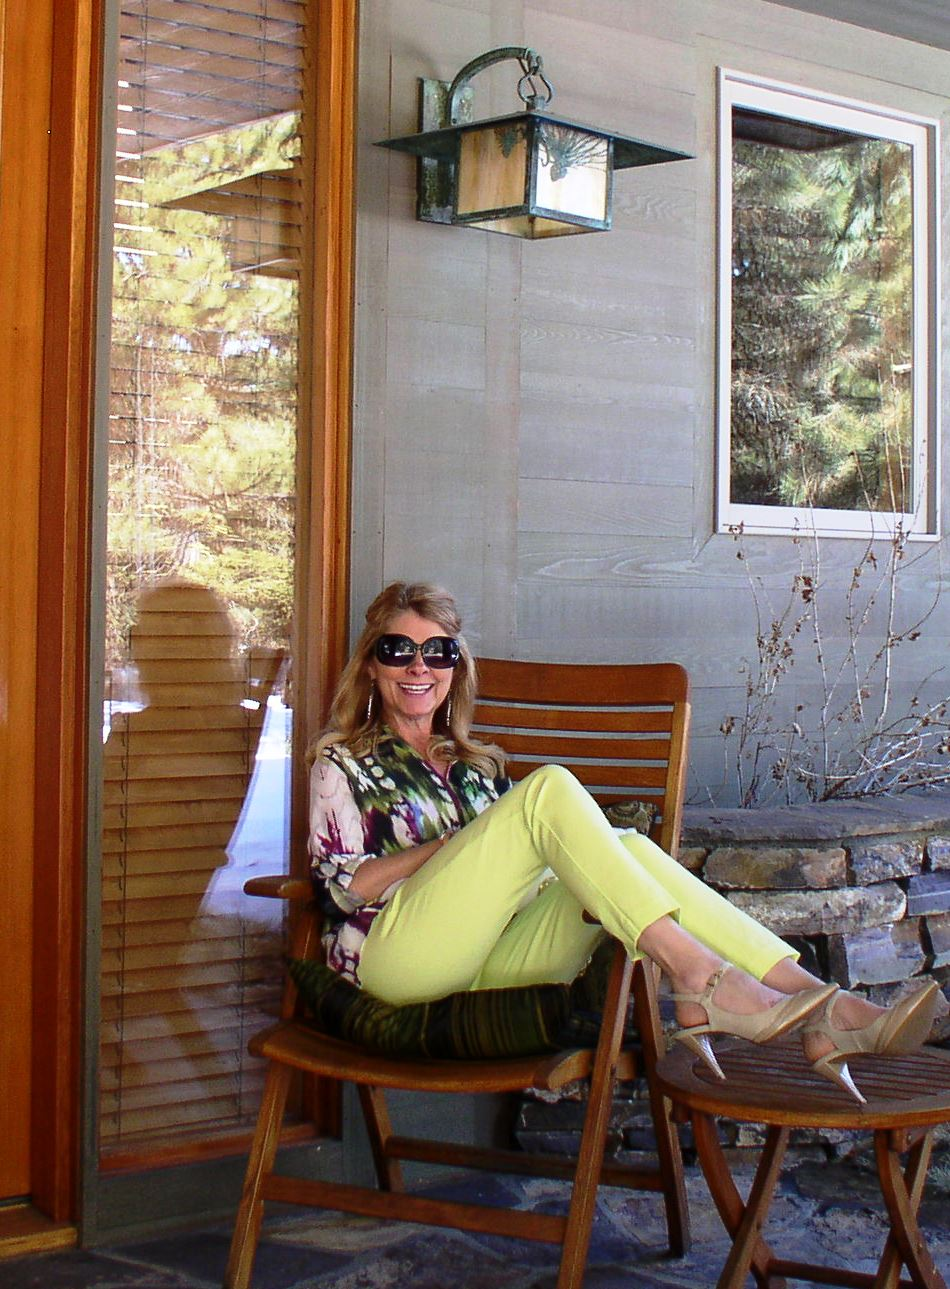 Neon Green Pants and Sweet Feet